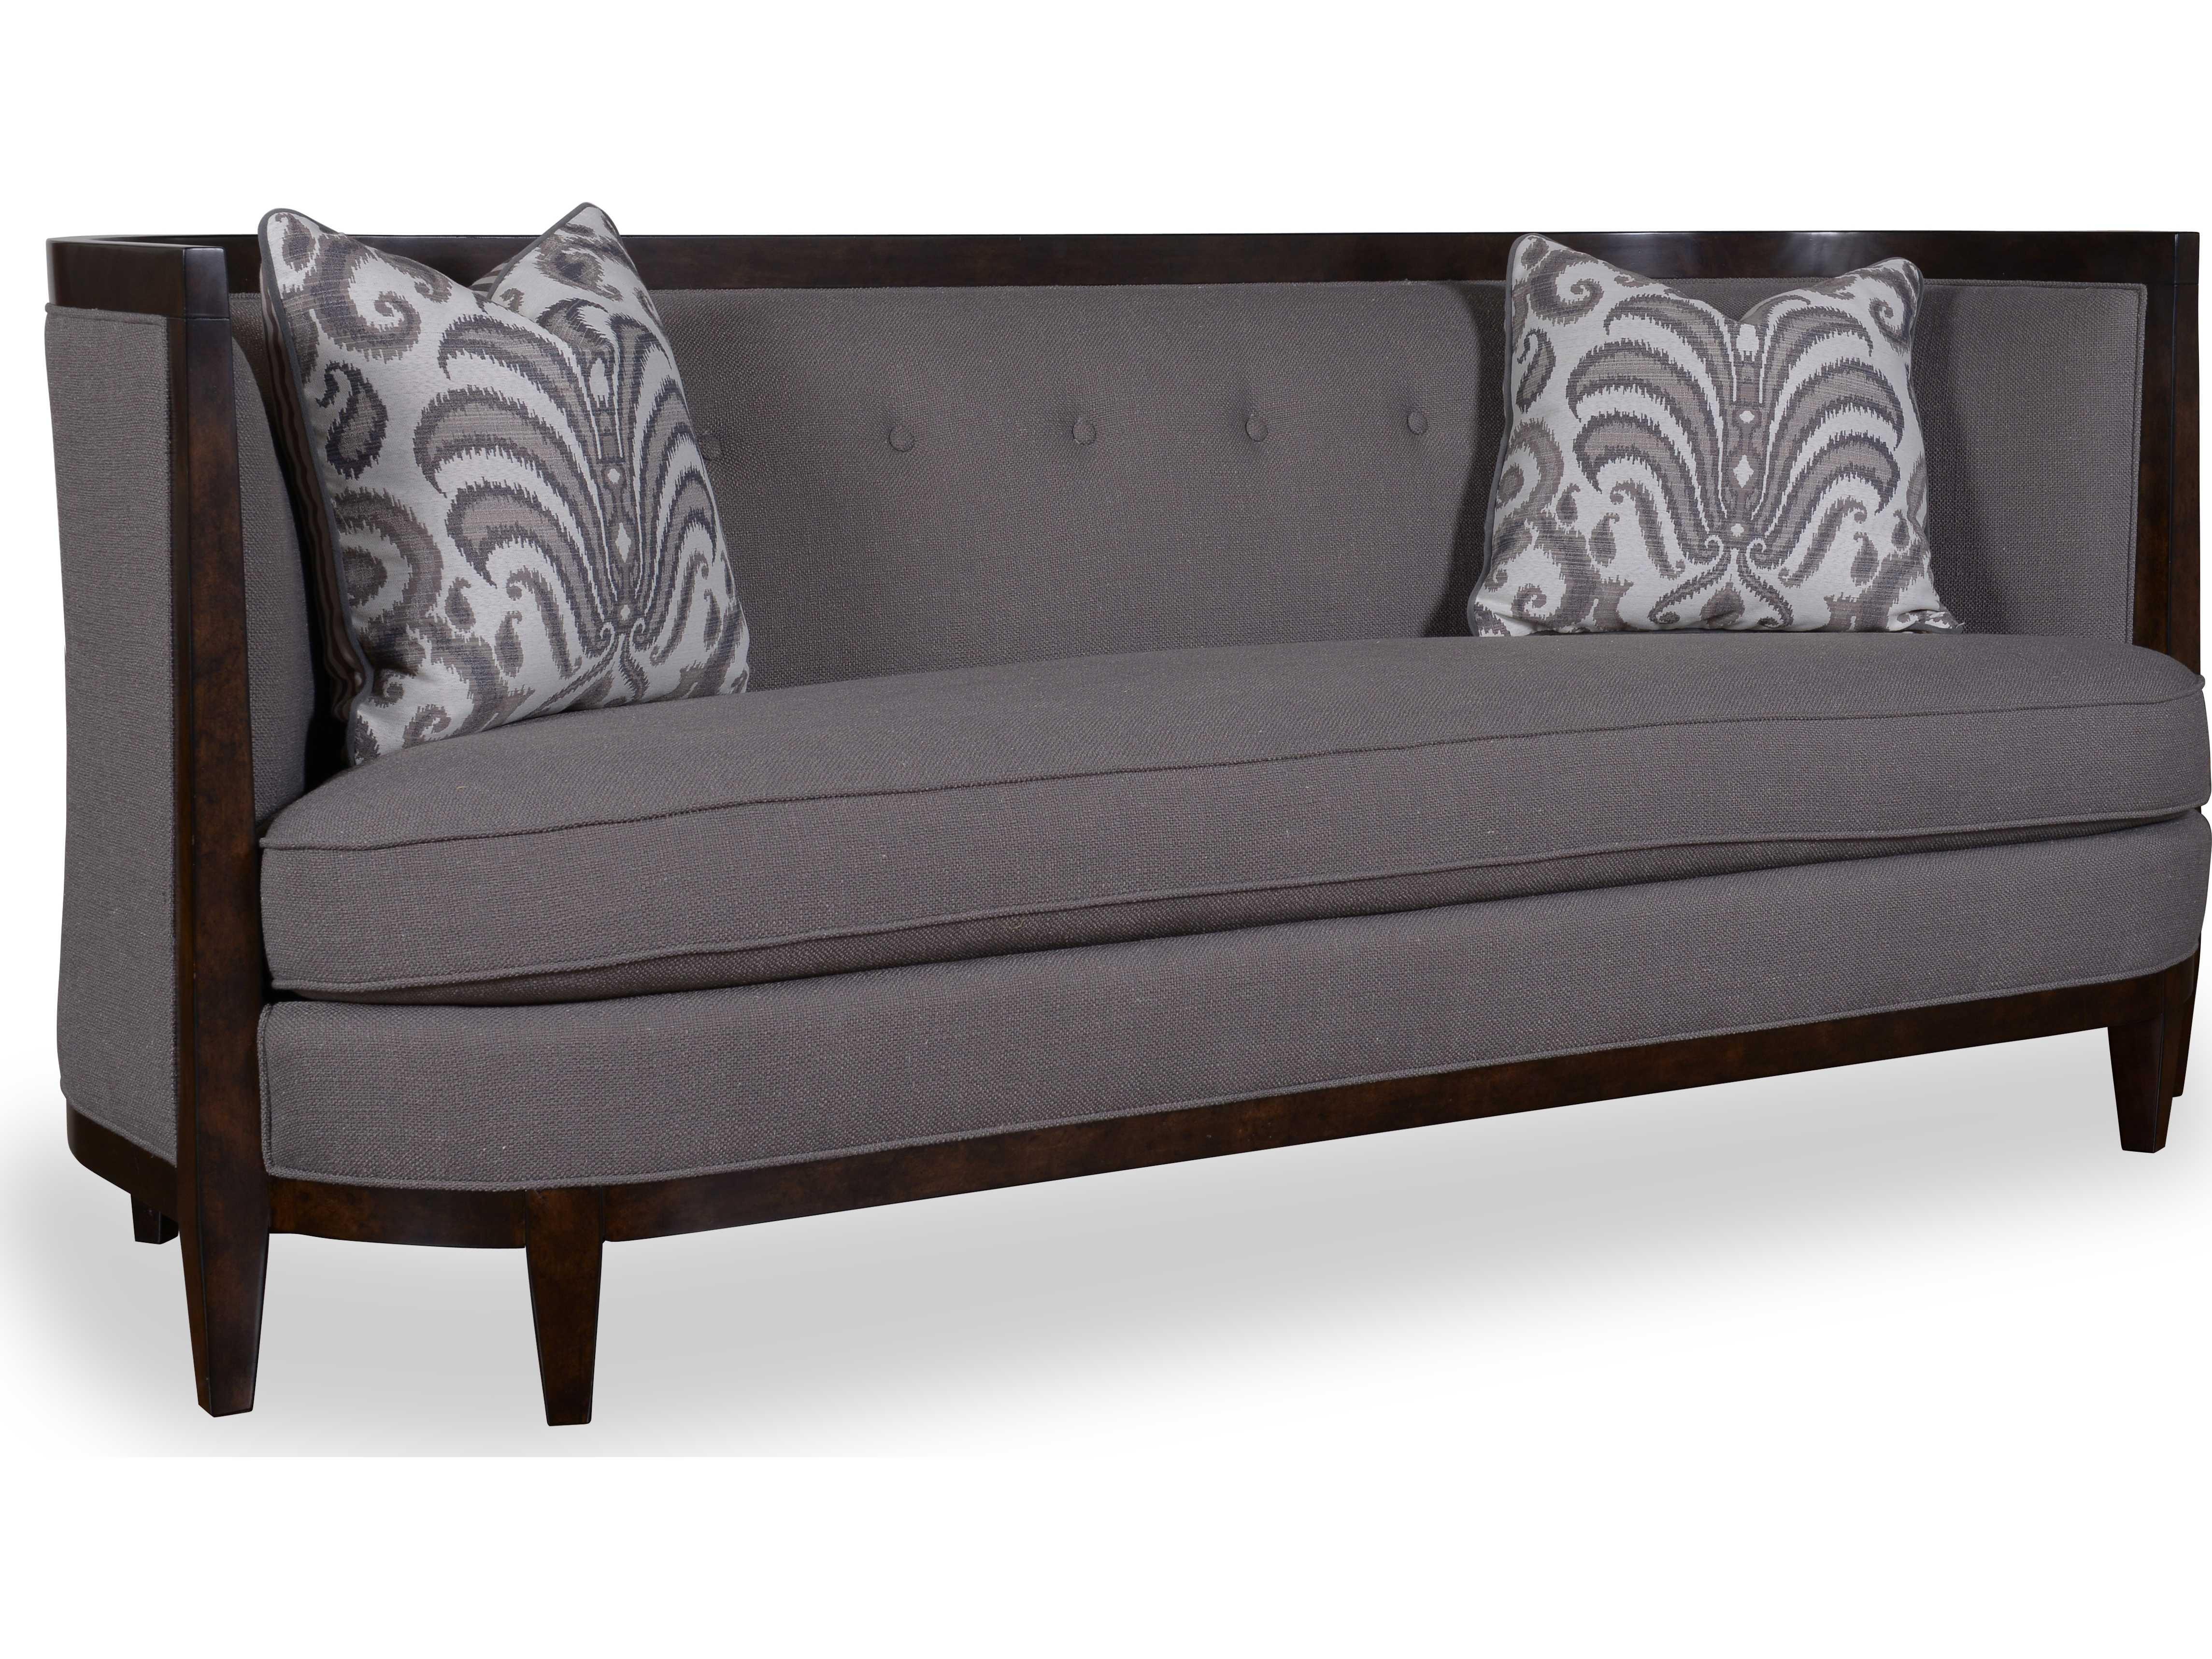 ART Furniture Morgan Charcoal Brindle Sofa